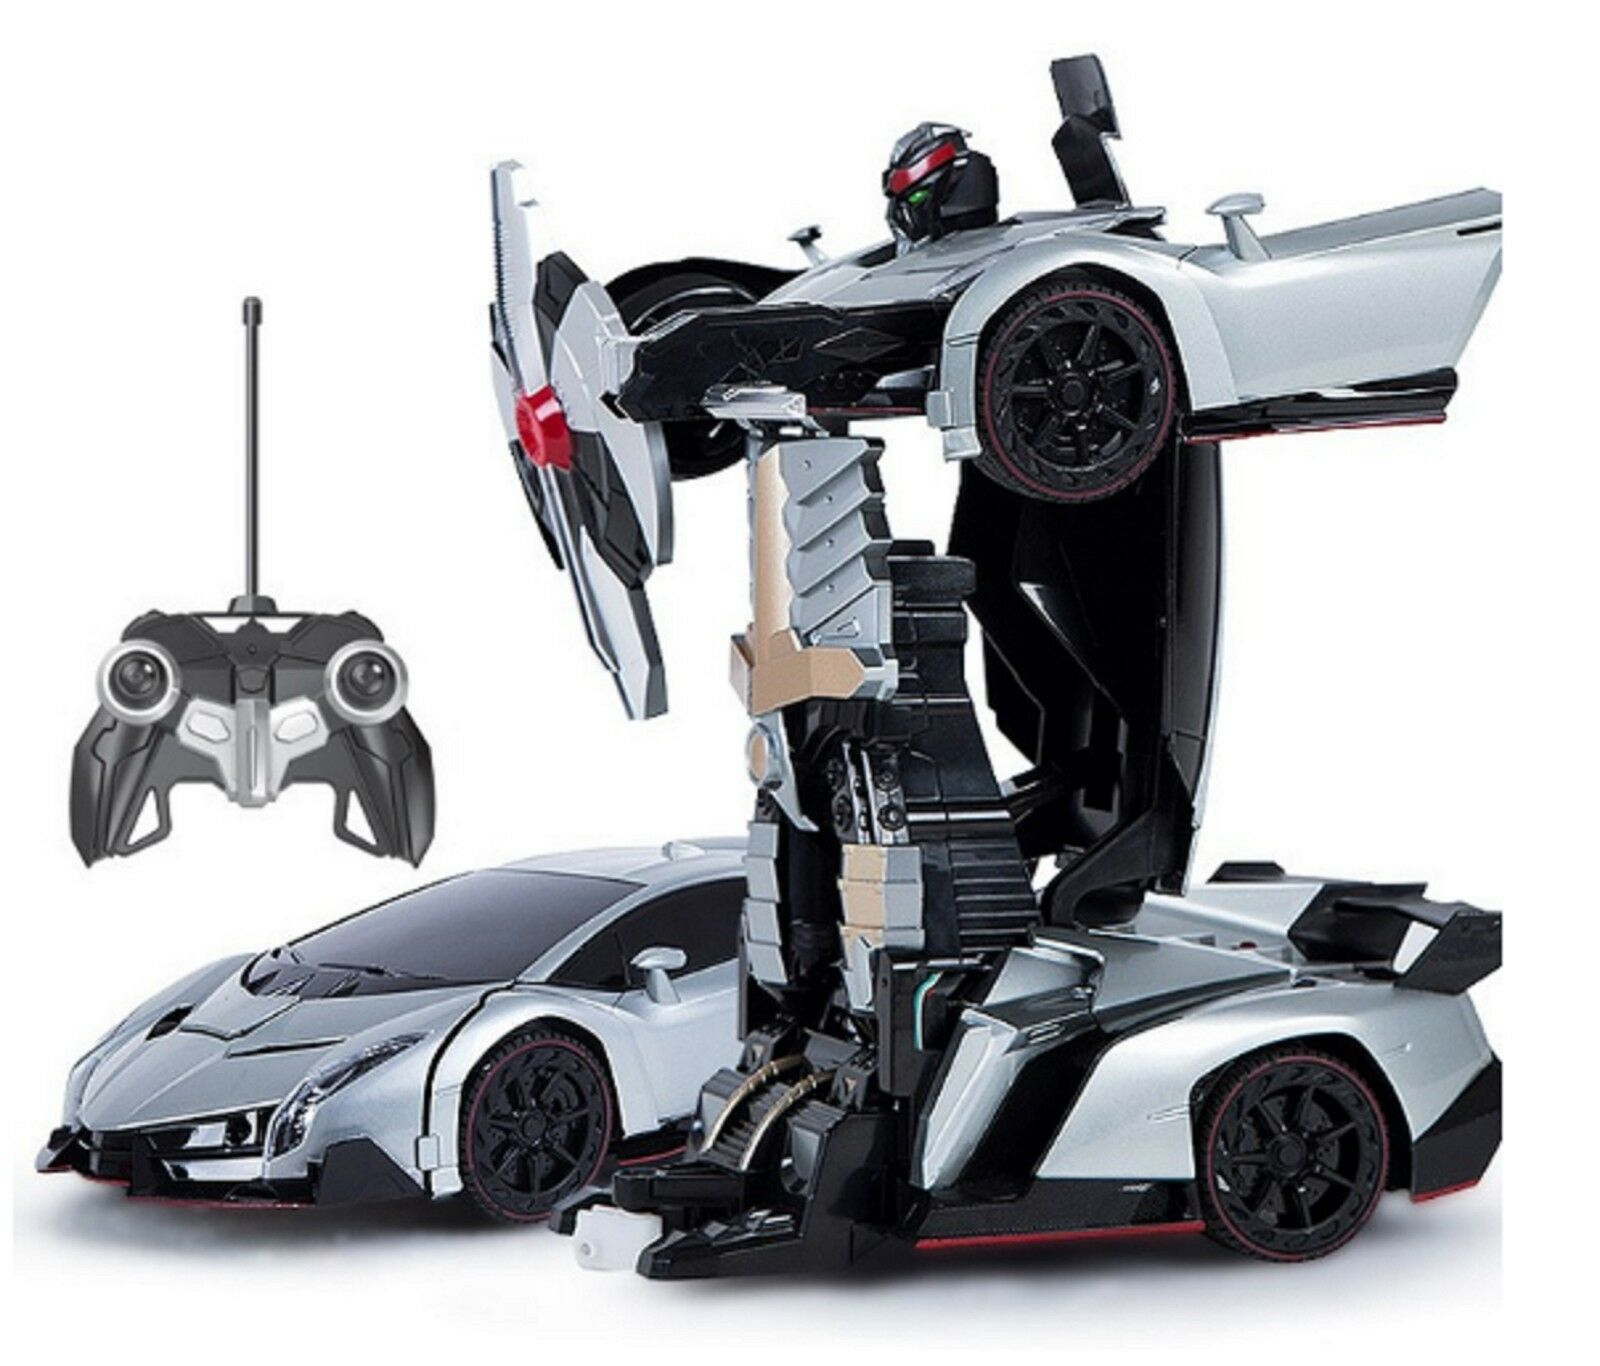 mz transformers 2333x lockdown rc ir 8 toy robot car bumblebee